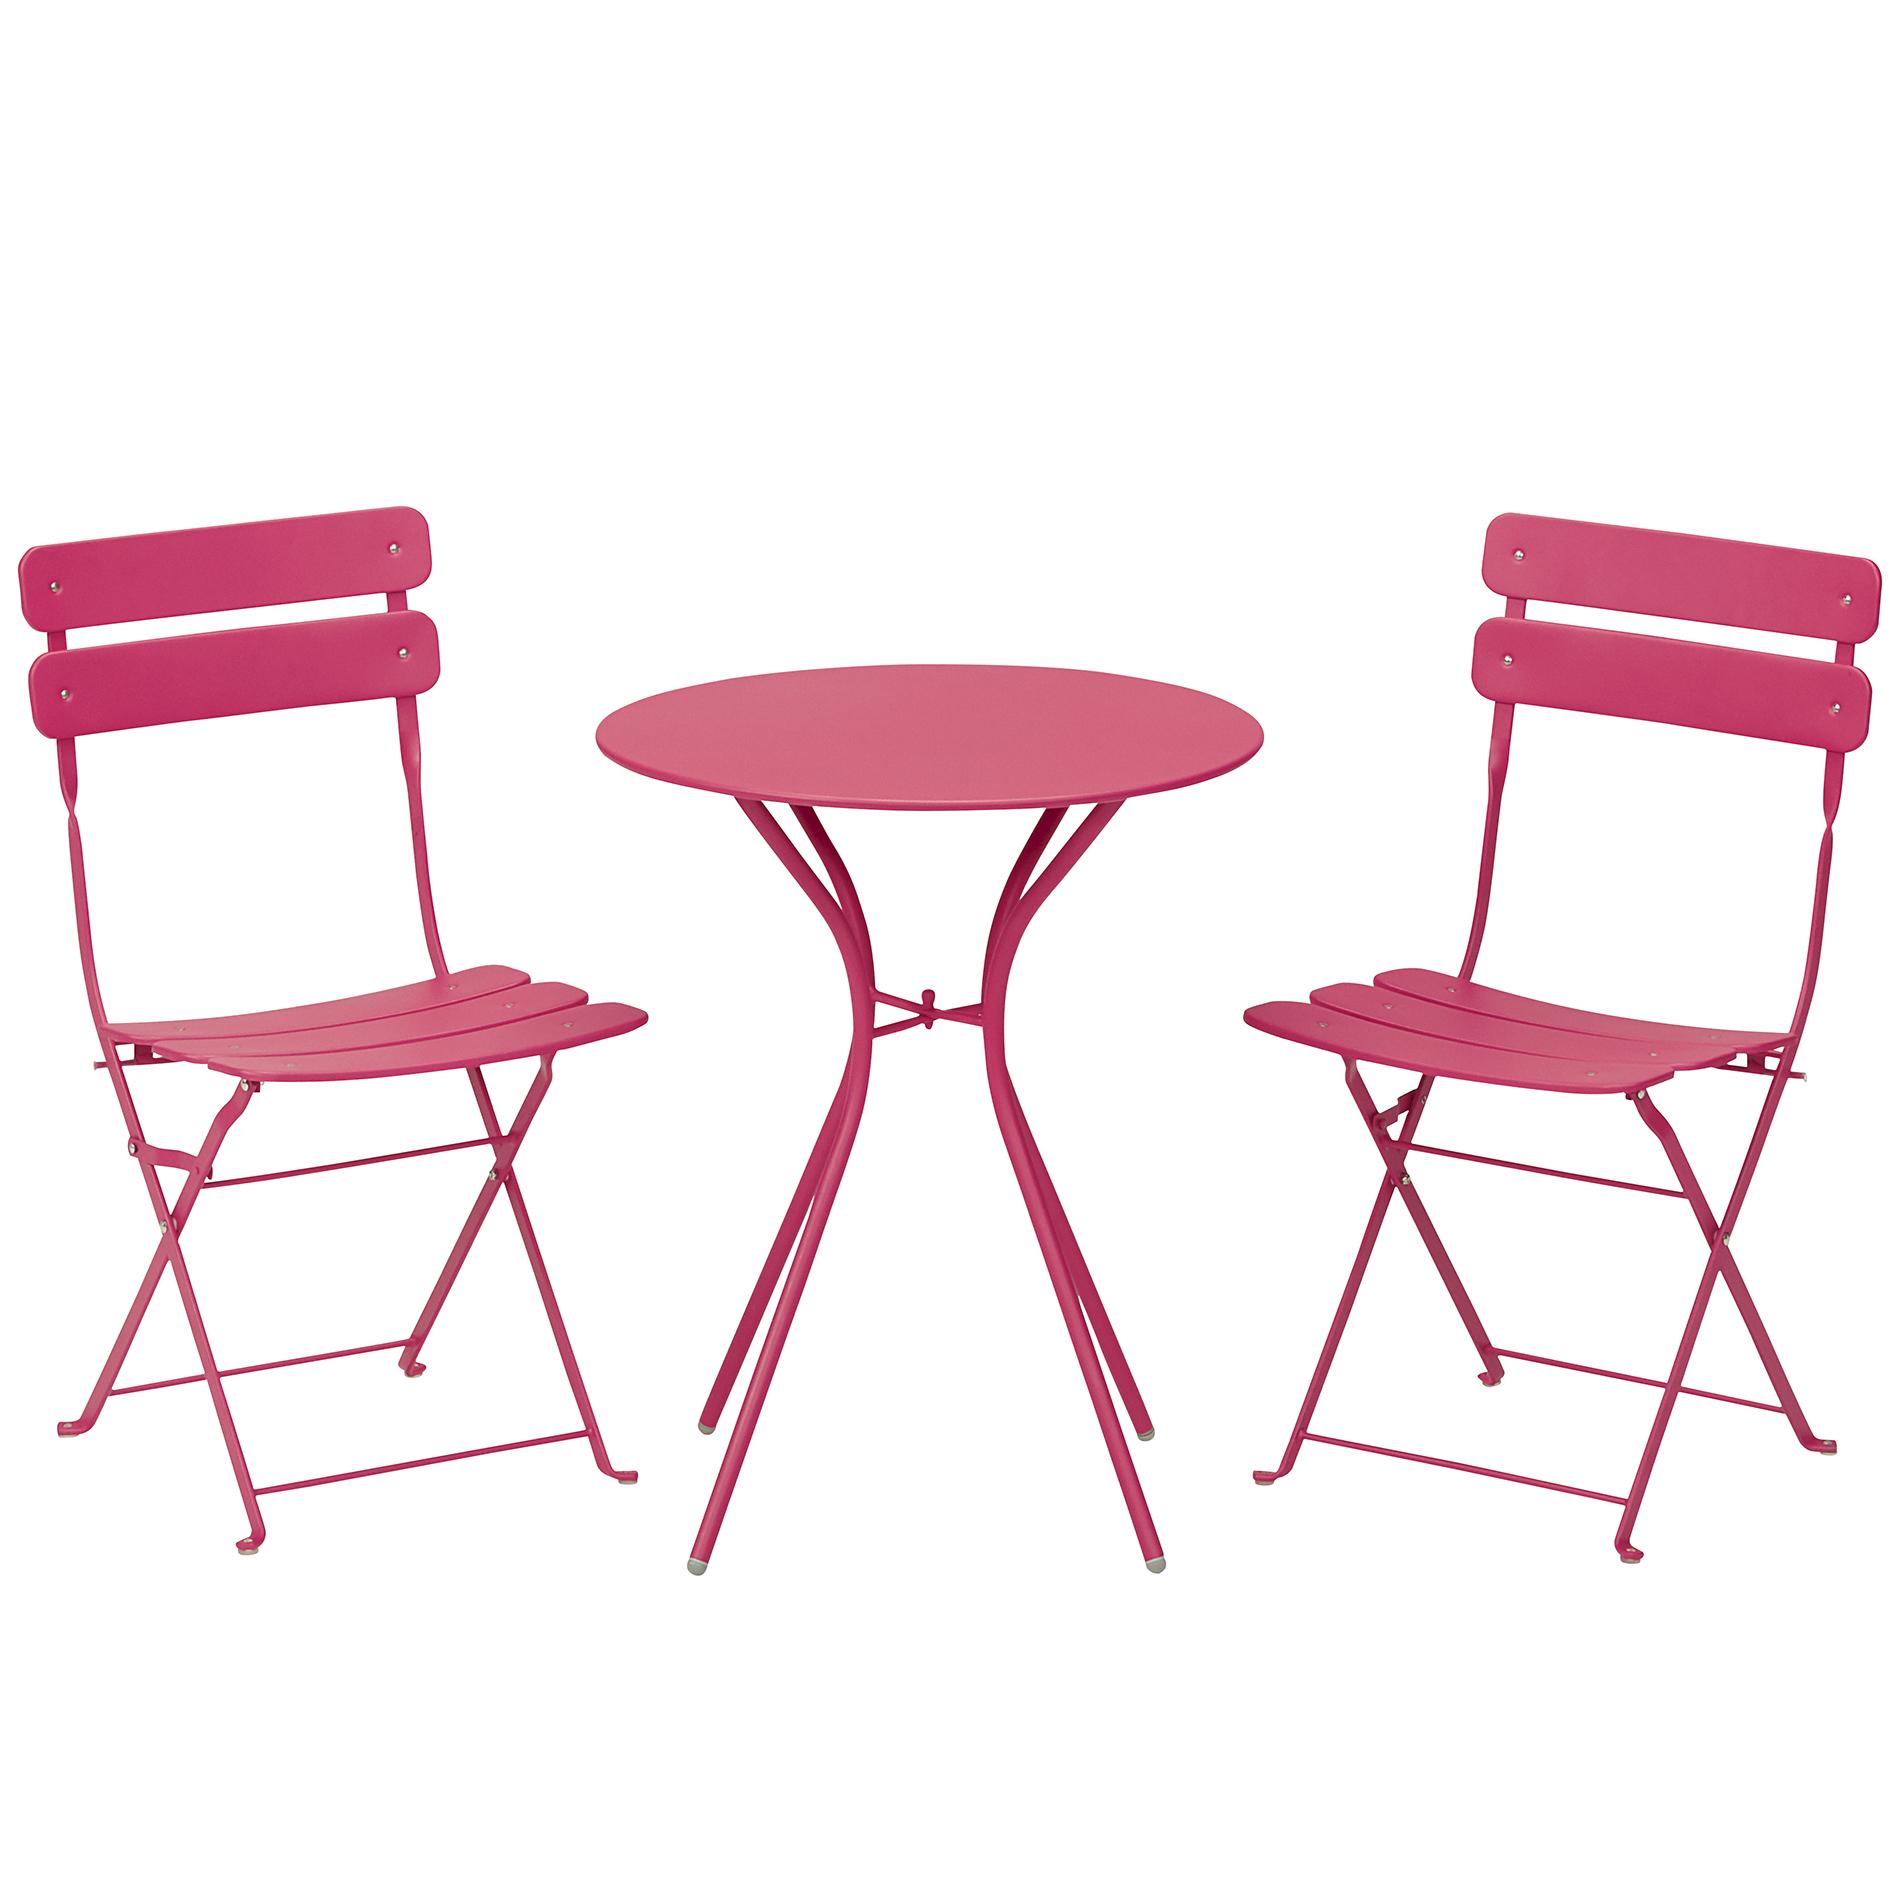 bistro table and chairs kmart veranda swing chair essential garden 3 piece folding set pink